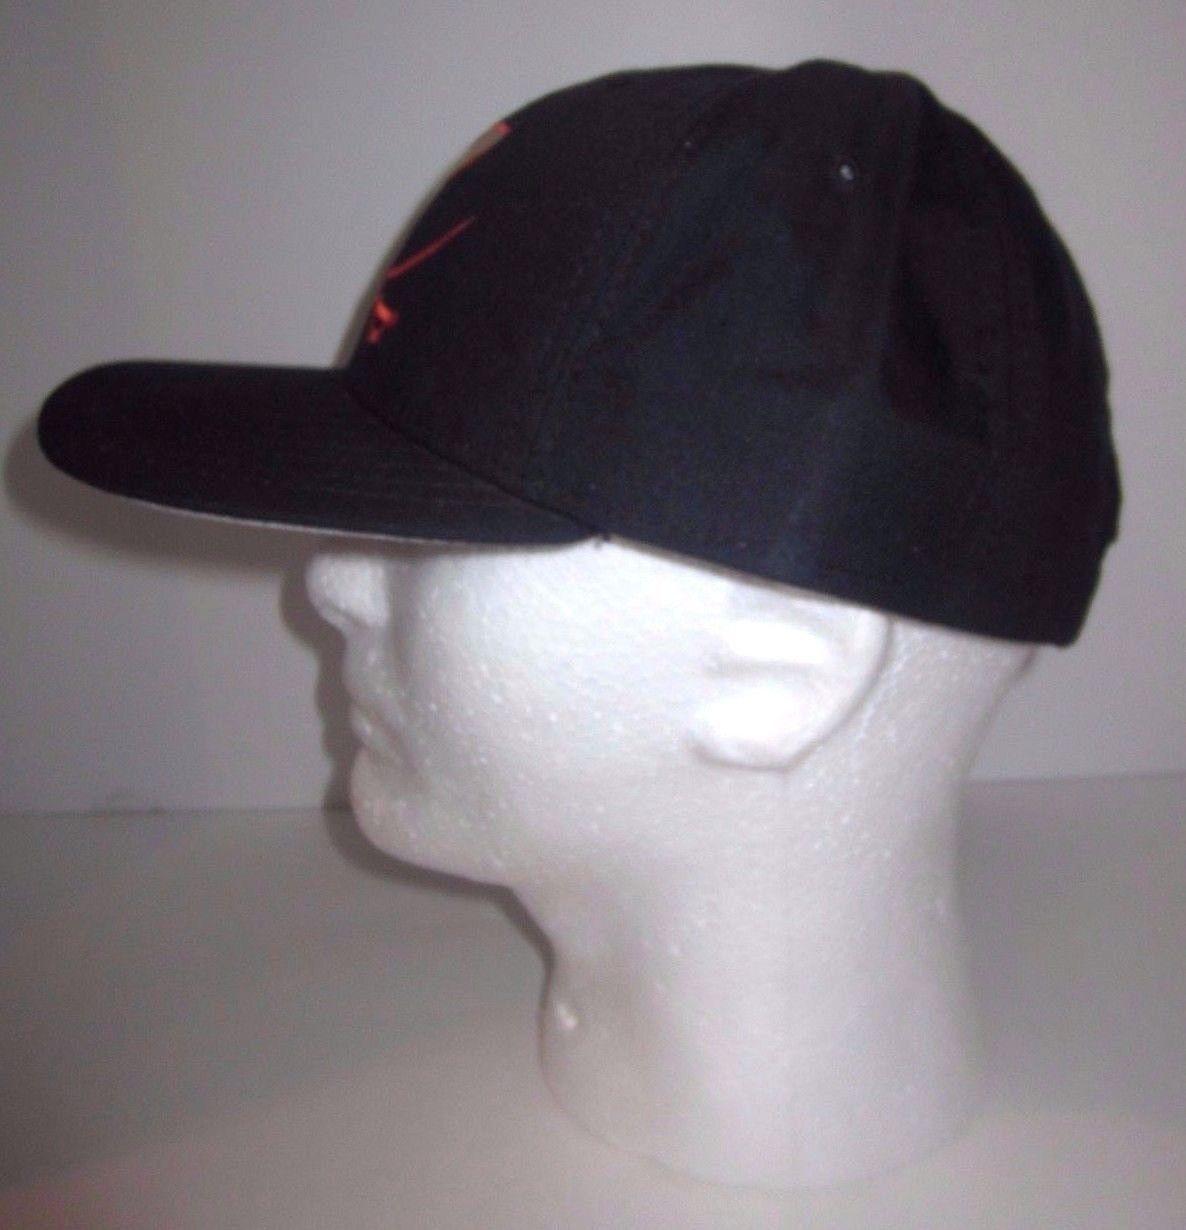 0856e5166a048 Virginia Cavaliers Hat - Vintage New Era Dupont Visor- Snapback - Made In  USA